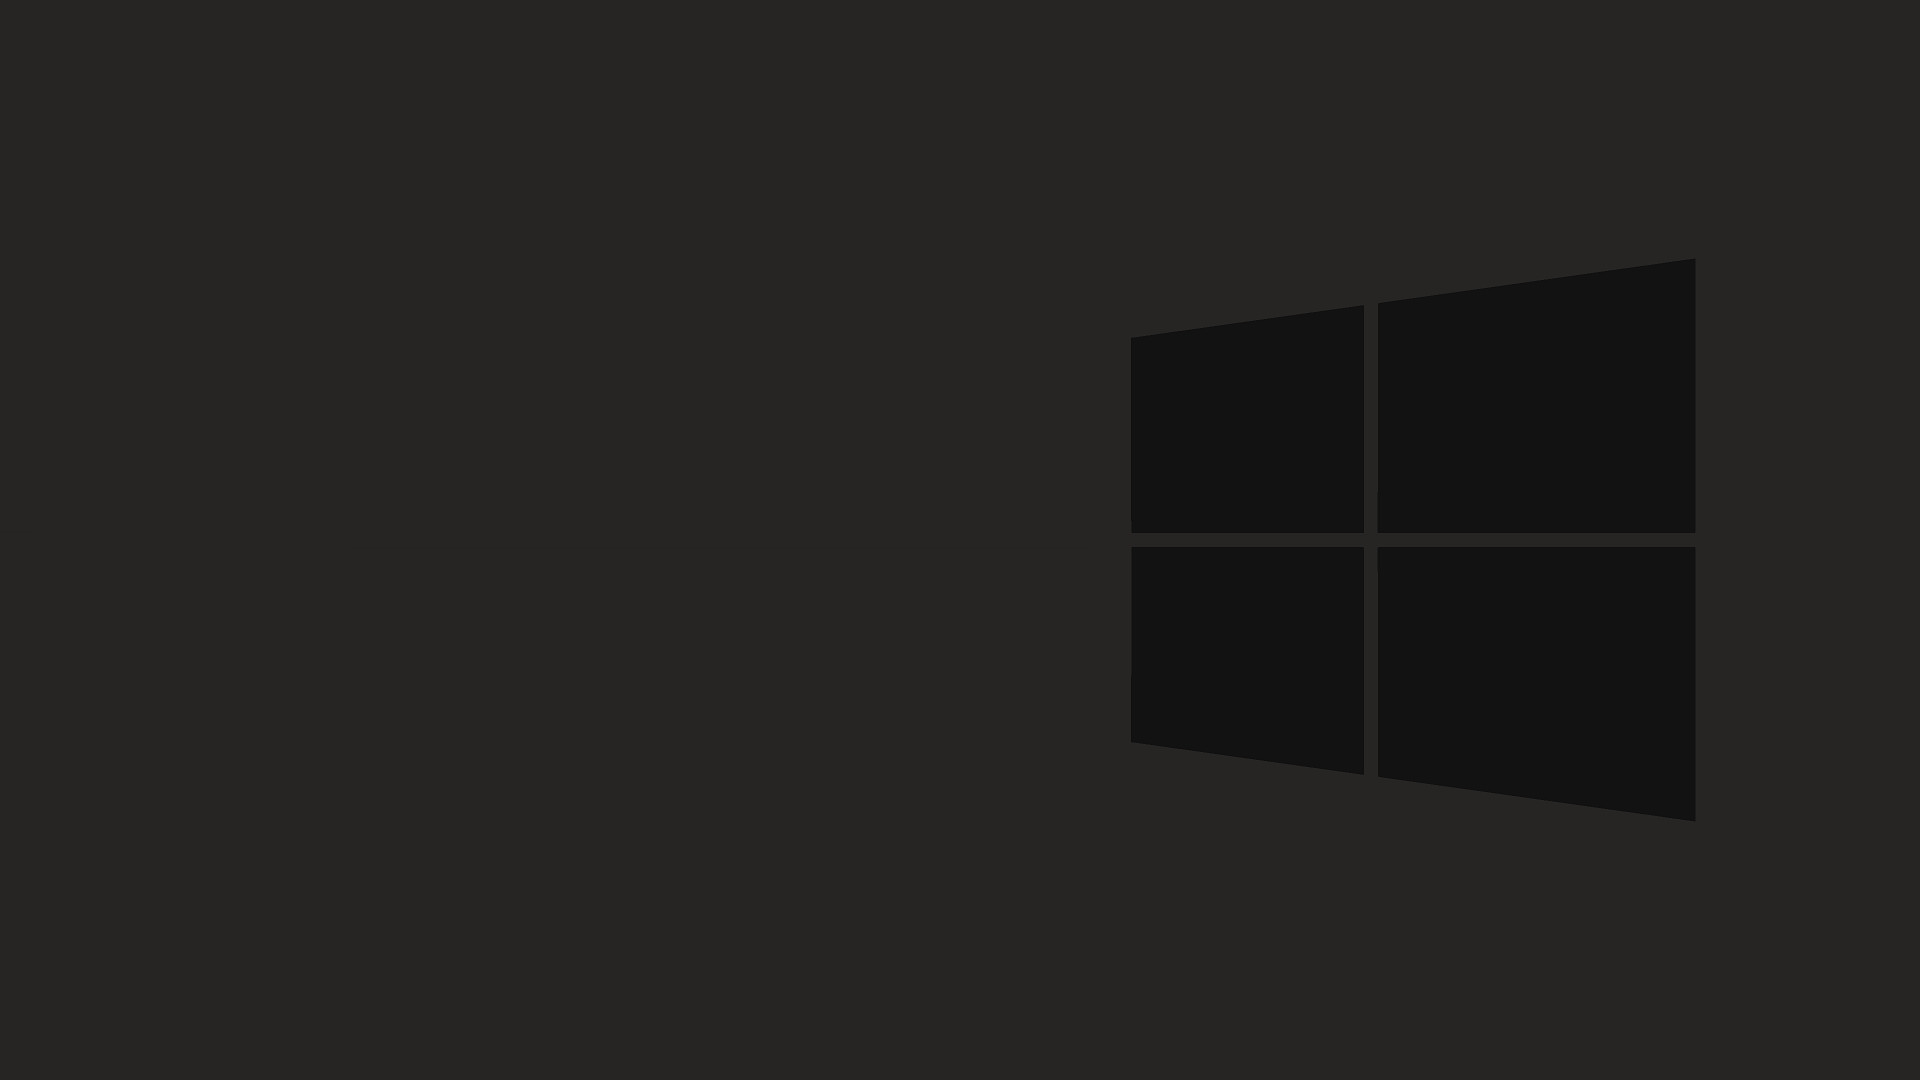 [1080P]Minimal Windows 10 wallpaper. 4K in comments.